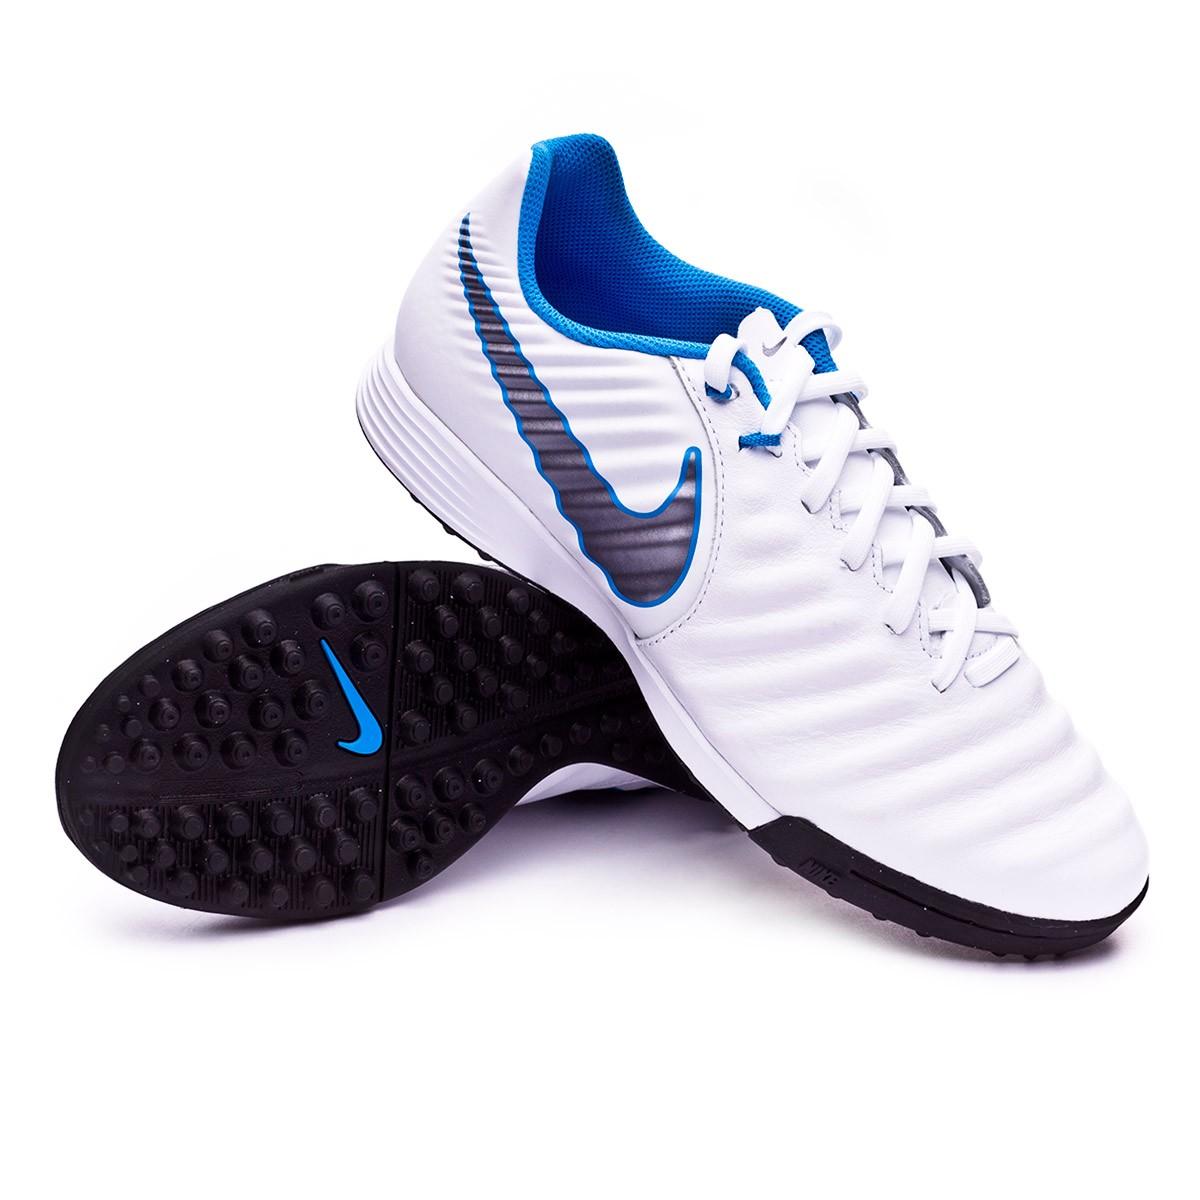 d328e8f24e482 Nike Tiempo LegendX VII Academy Turf Football Boot. White-Metallic cool ...